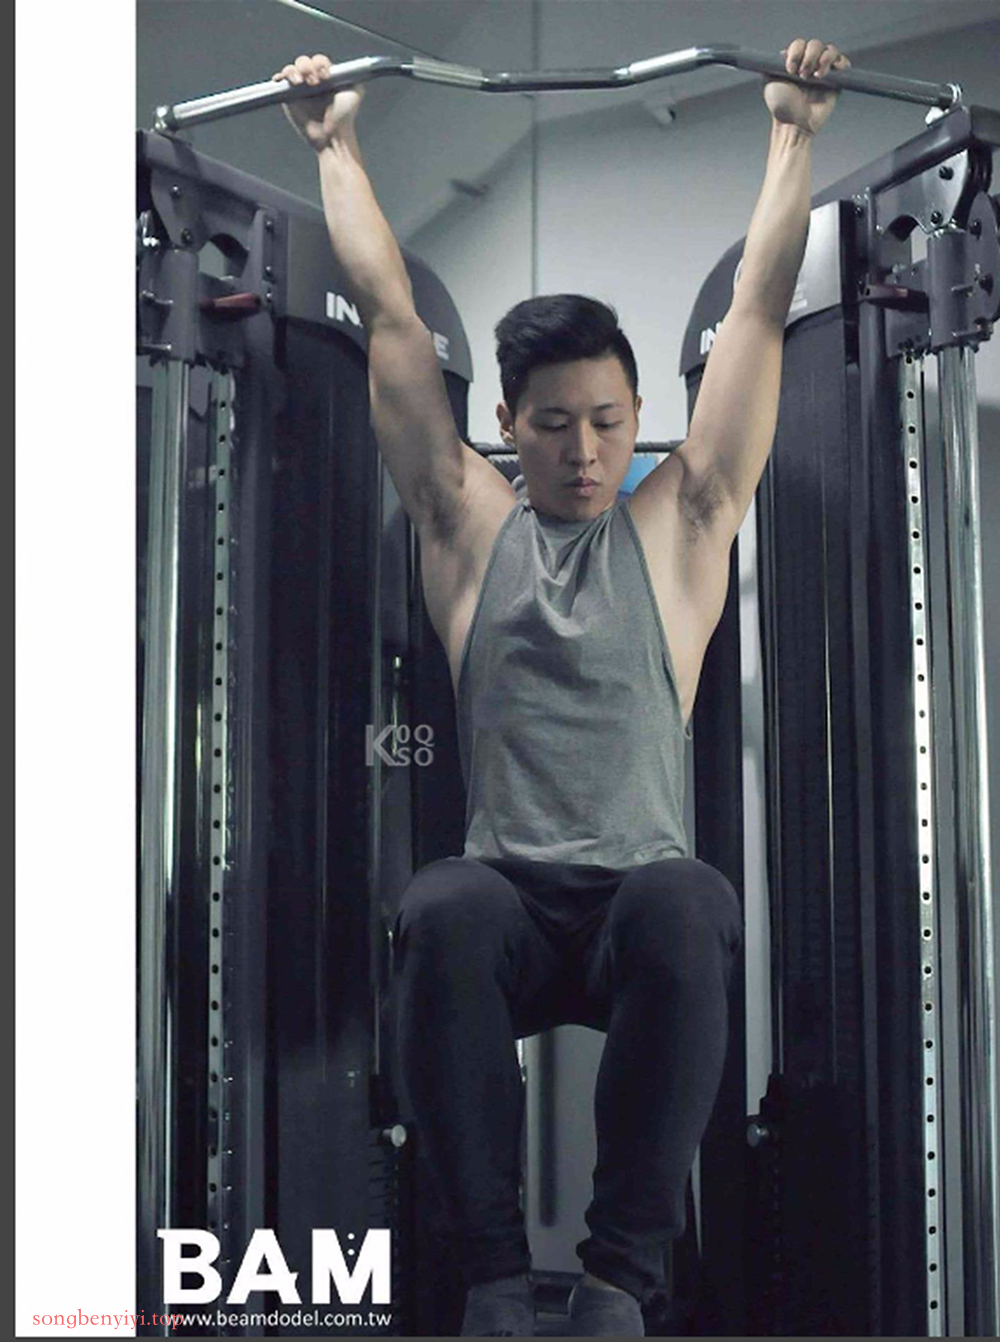 BE A MODEL 10高雄健身教練 躍身成為寫真男模 ED-12.png